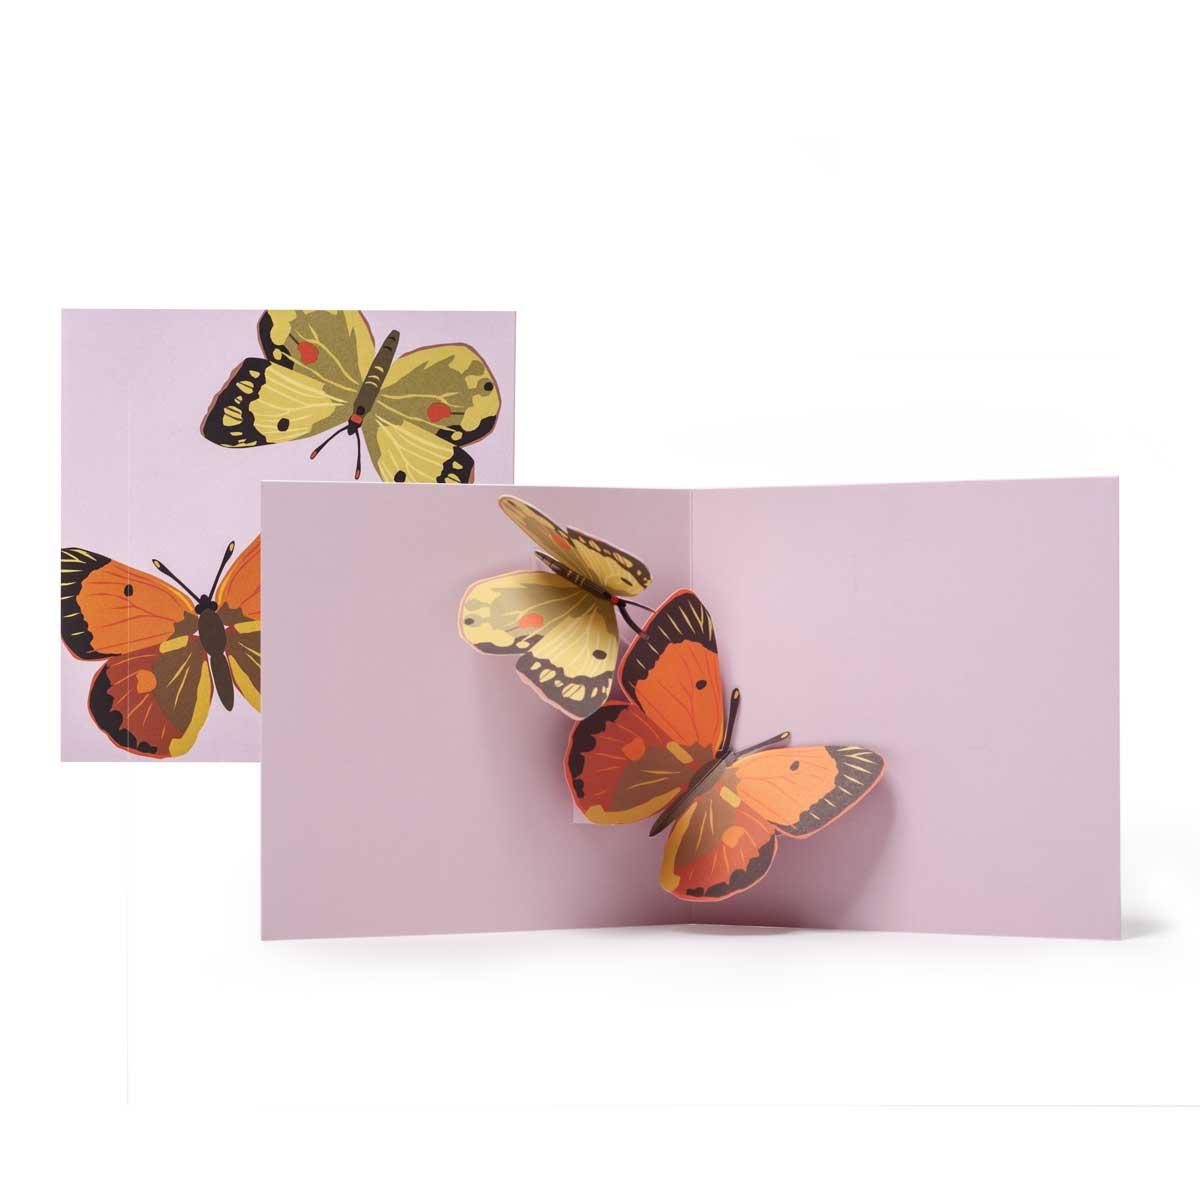 2-to-Tango_Two-Butterfly-Pop-up-card_MaikeBiederstaedt.jpg